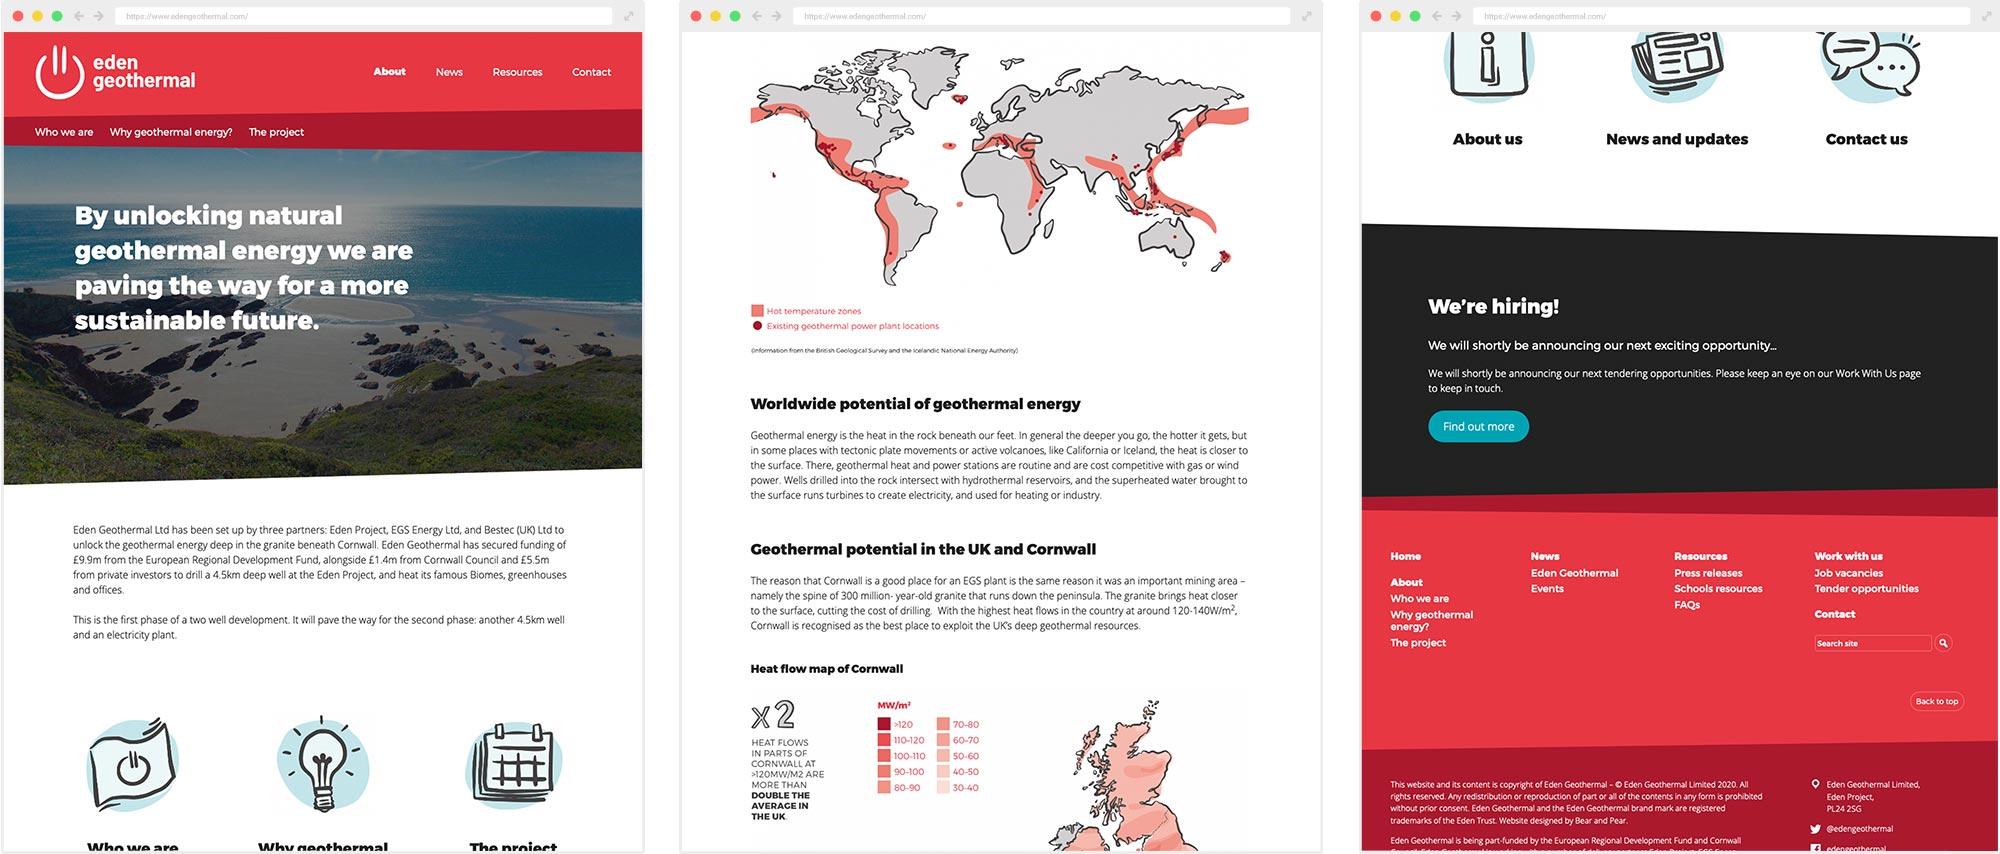 Eden Geothermal website